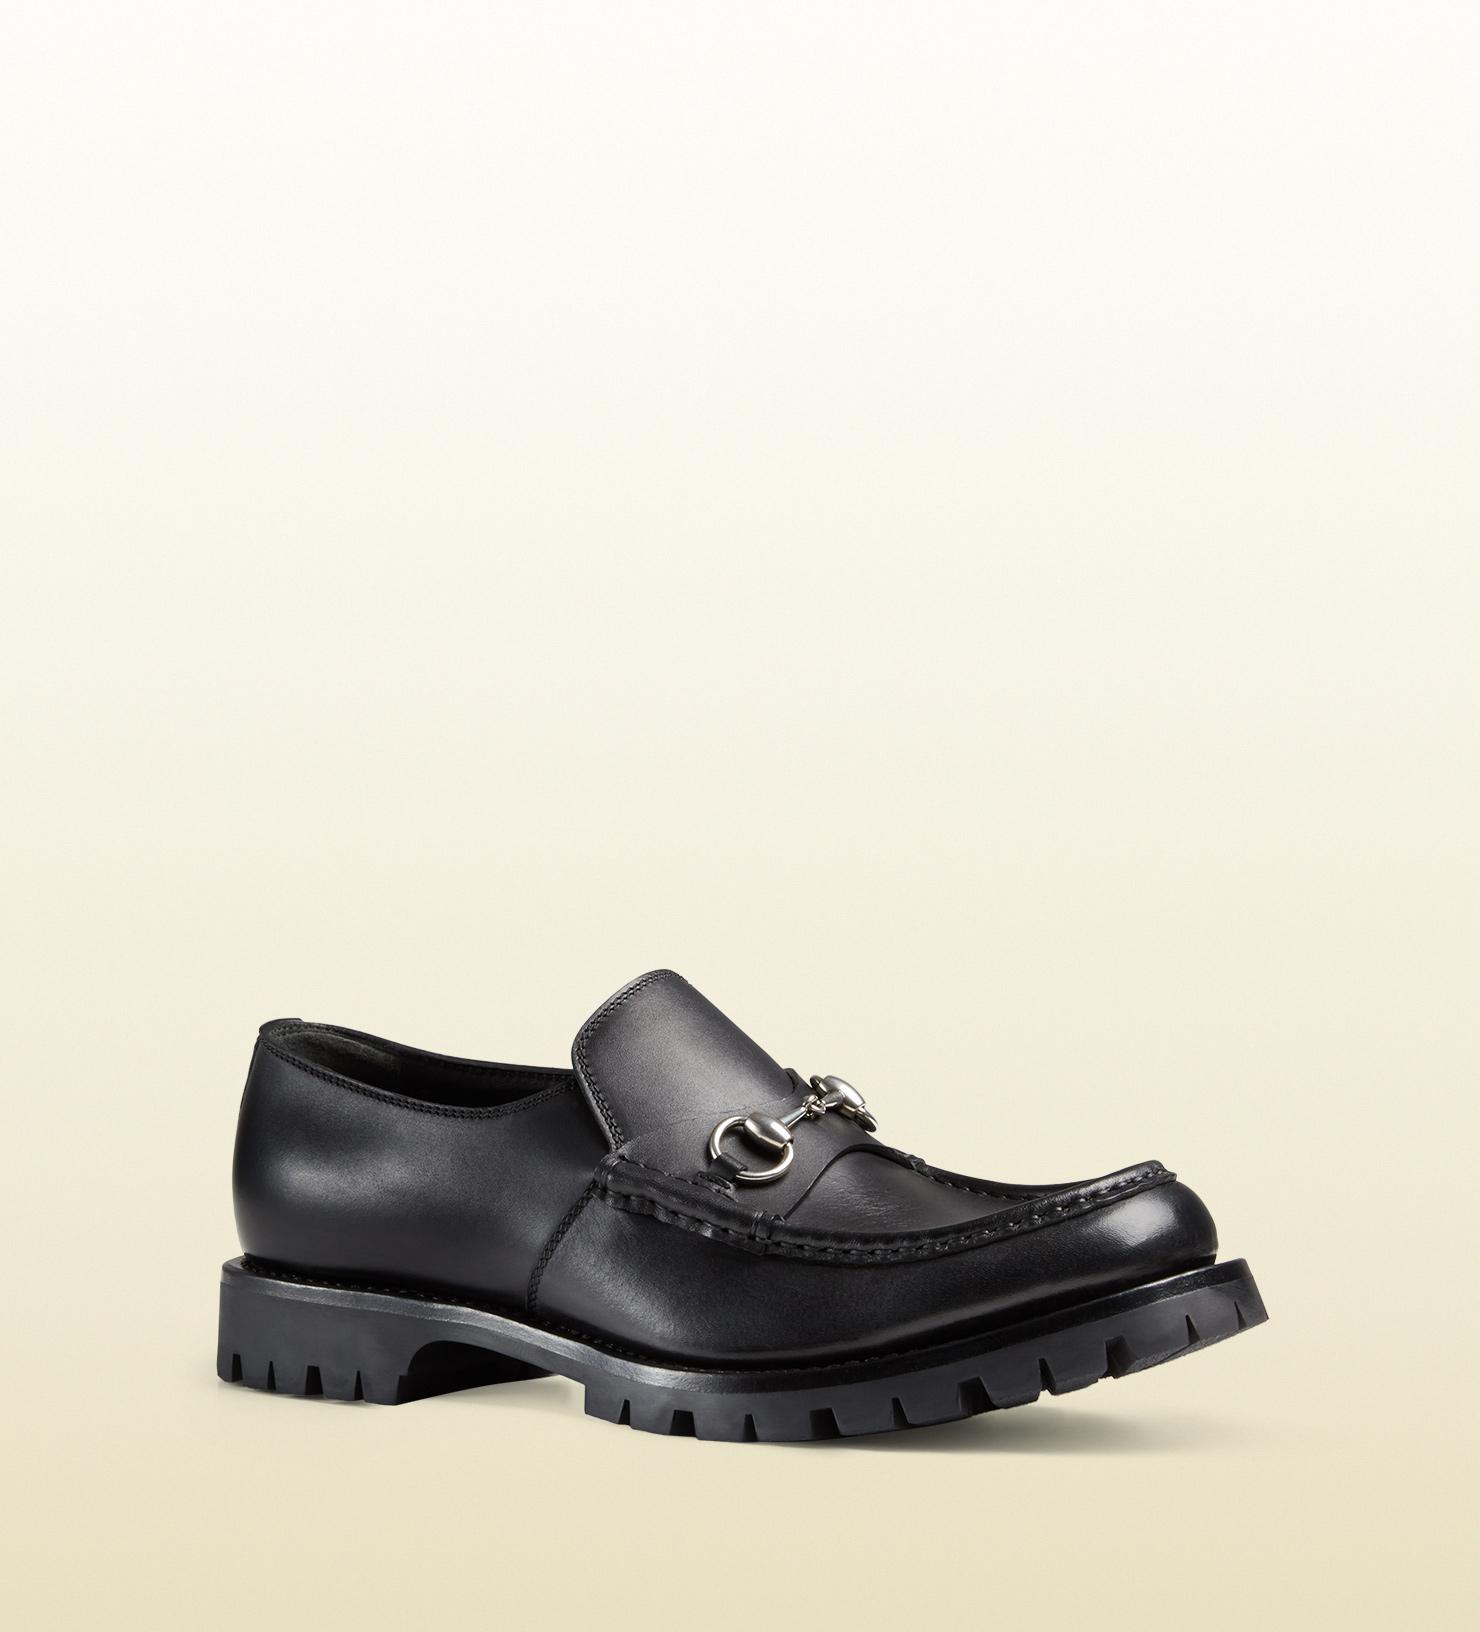 8bbe2634b61f Lyst - Gucci Men s Leather Lug Sole Horsebit Loafer in Black for Men